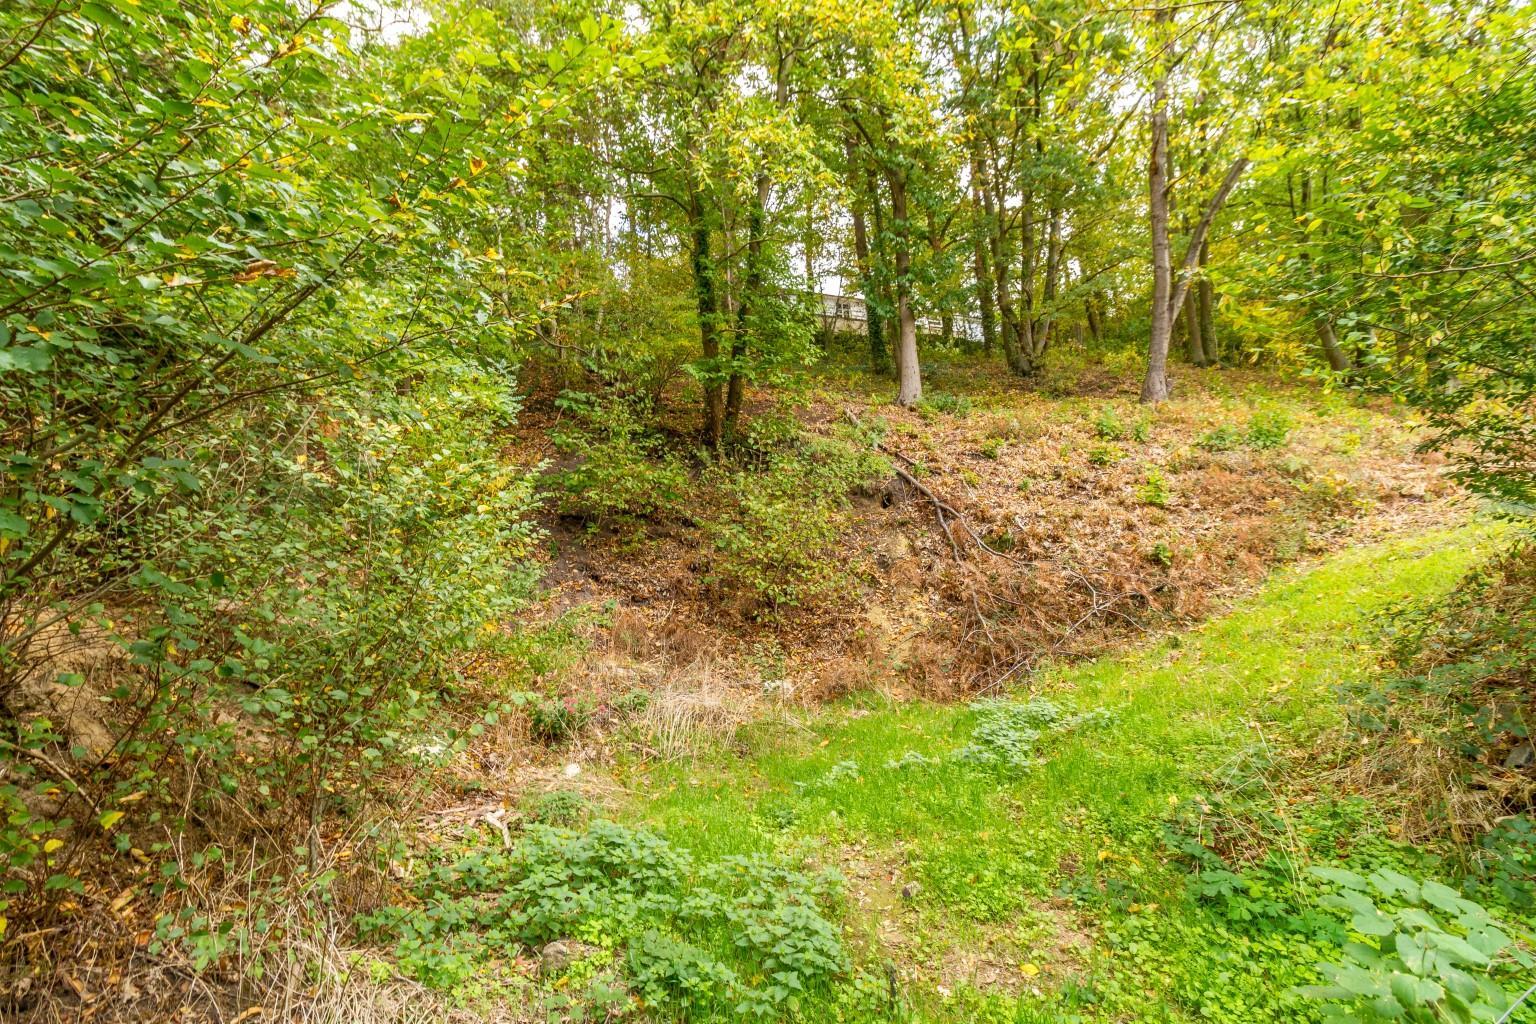 Terrain à bâtir - Ottignies-Louvain-la-Neuve - #3591481-4